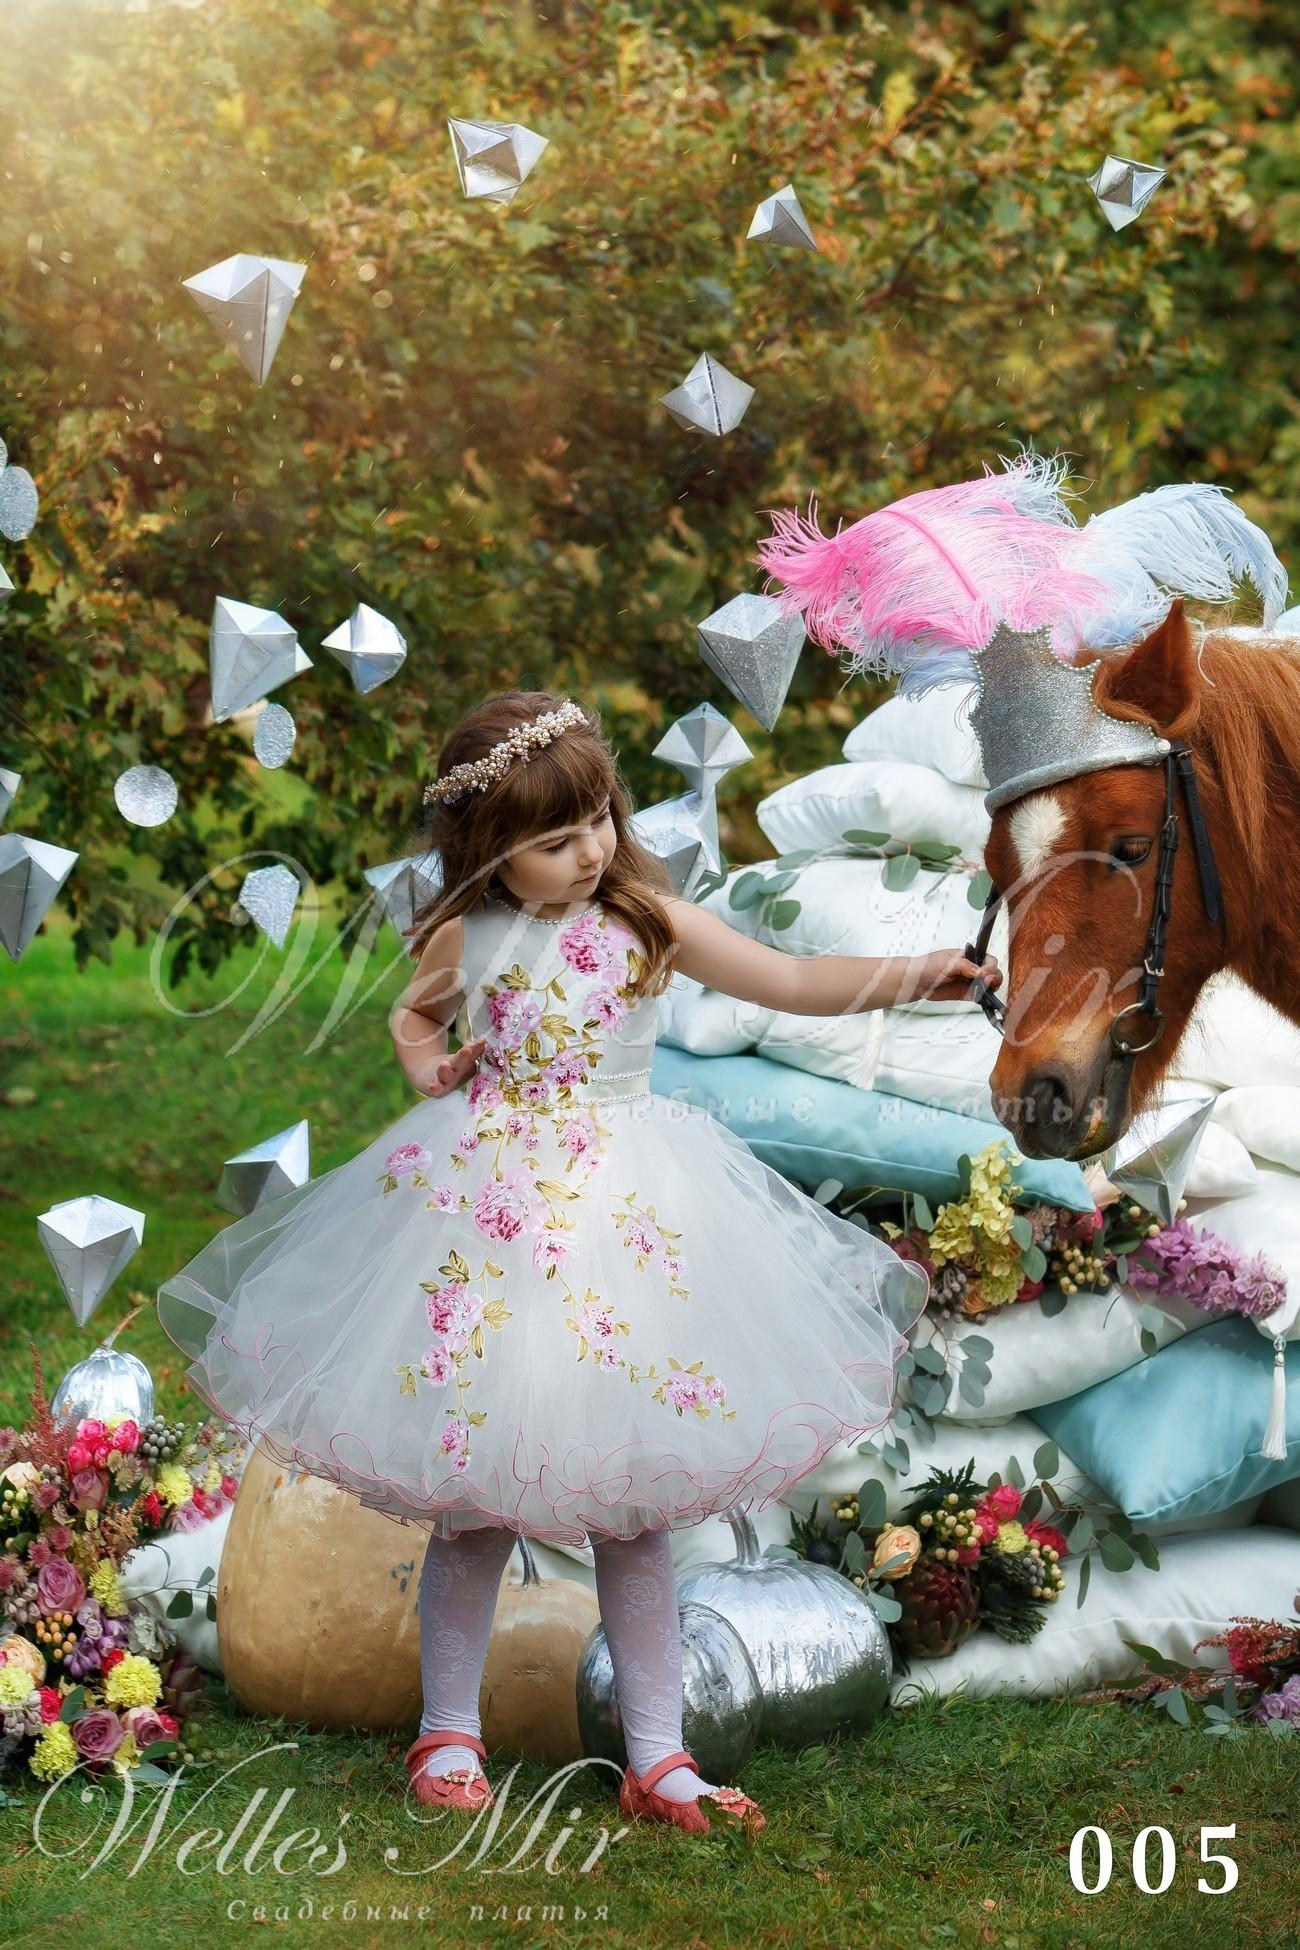 Детские платья Kids Deluxe Collection 2018 - 005